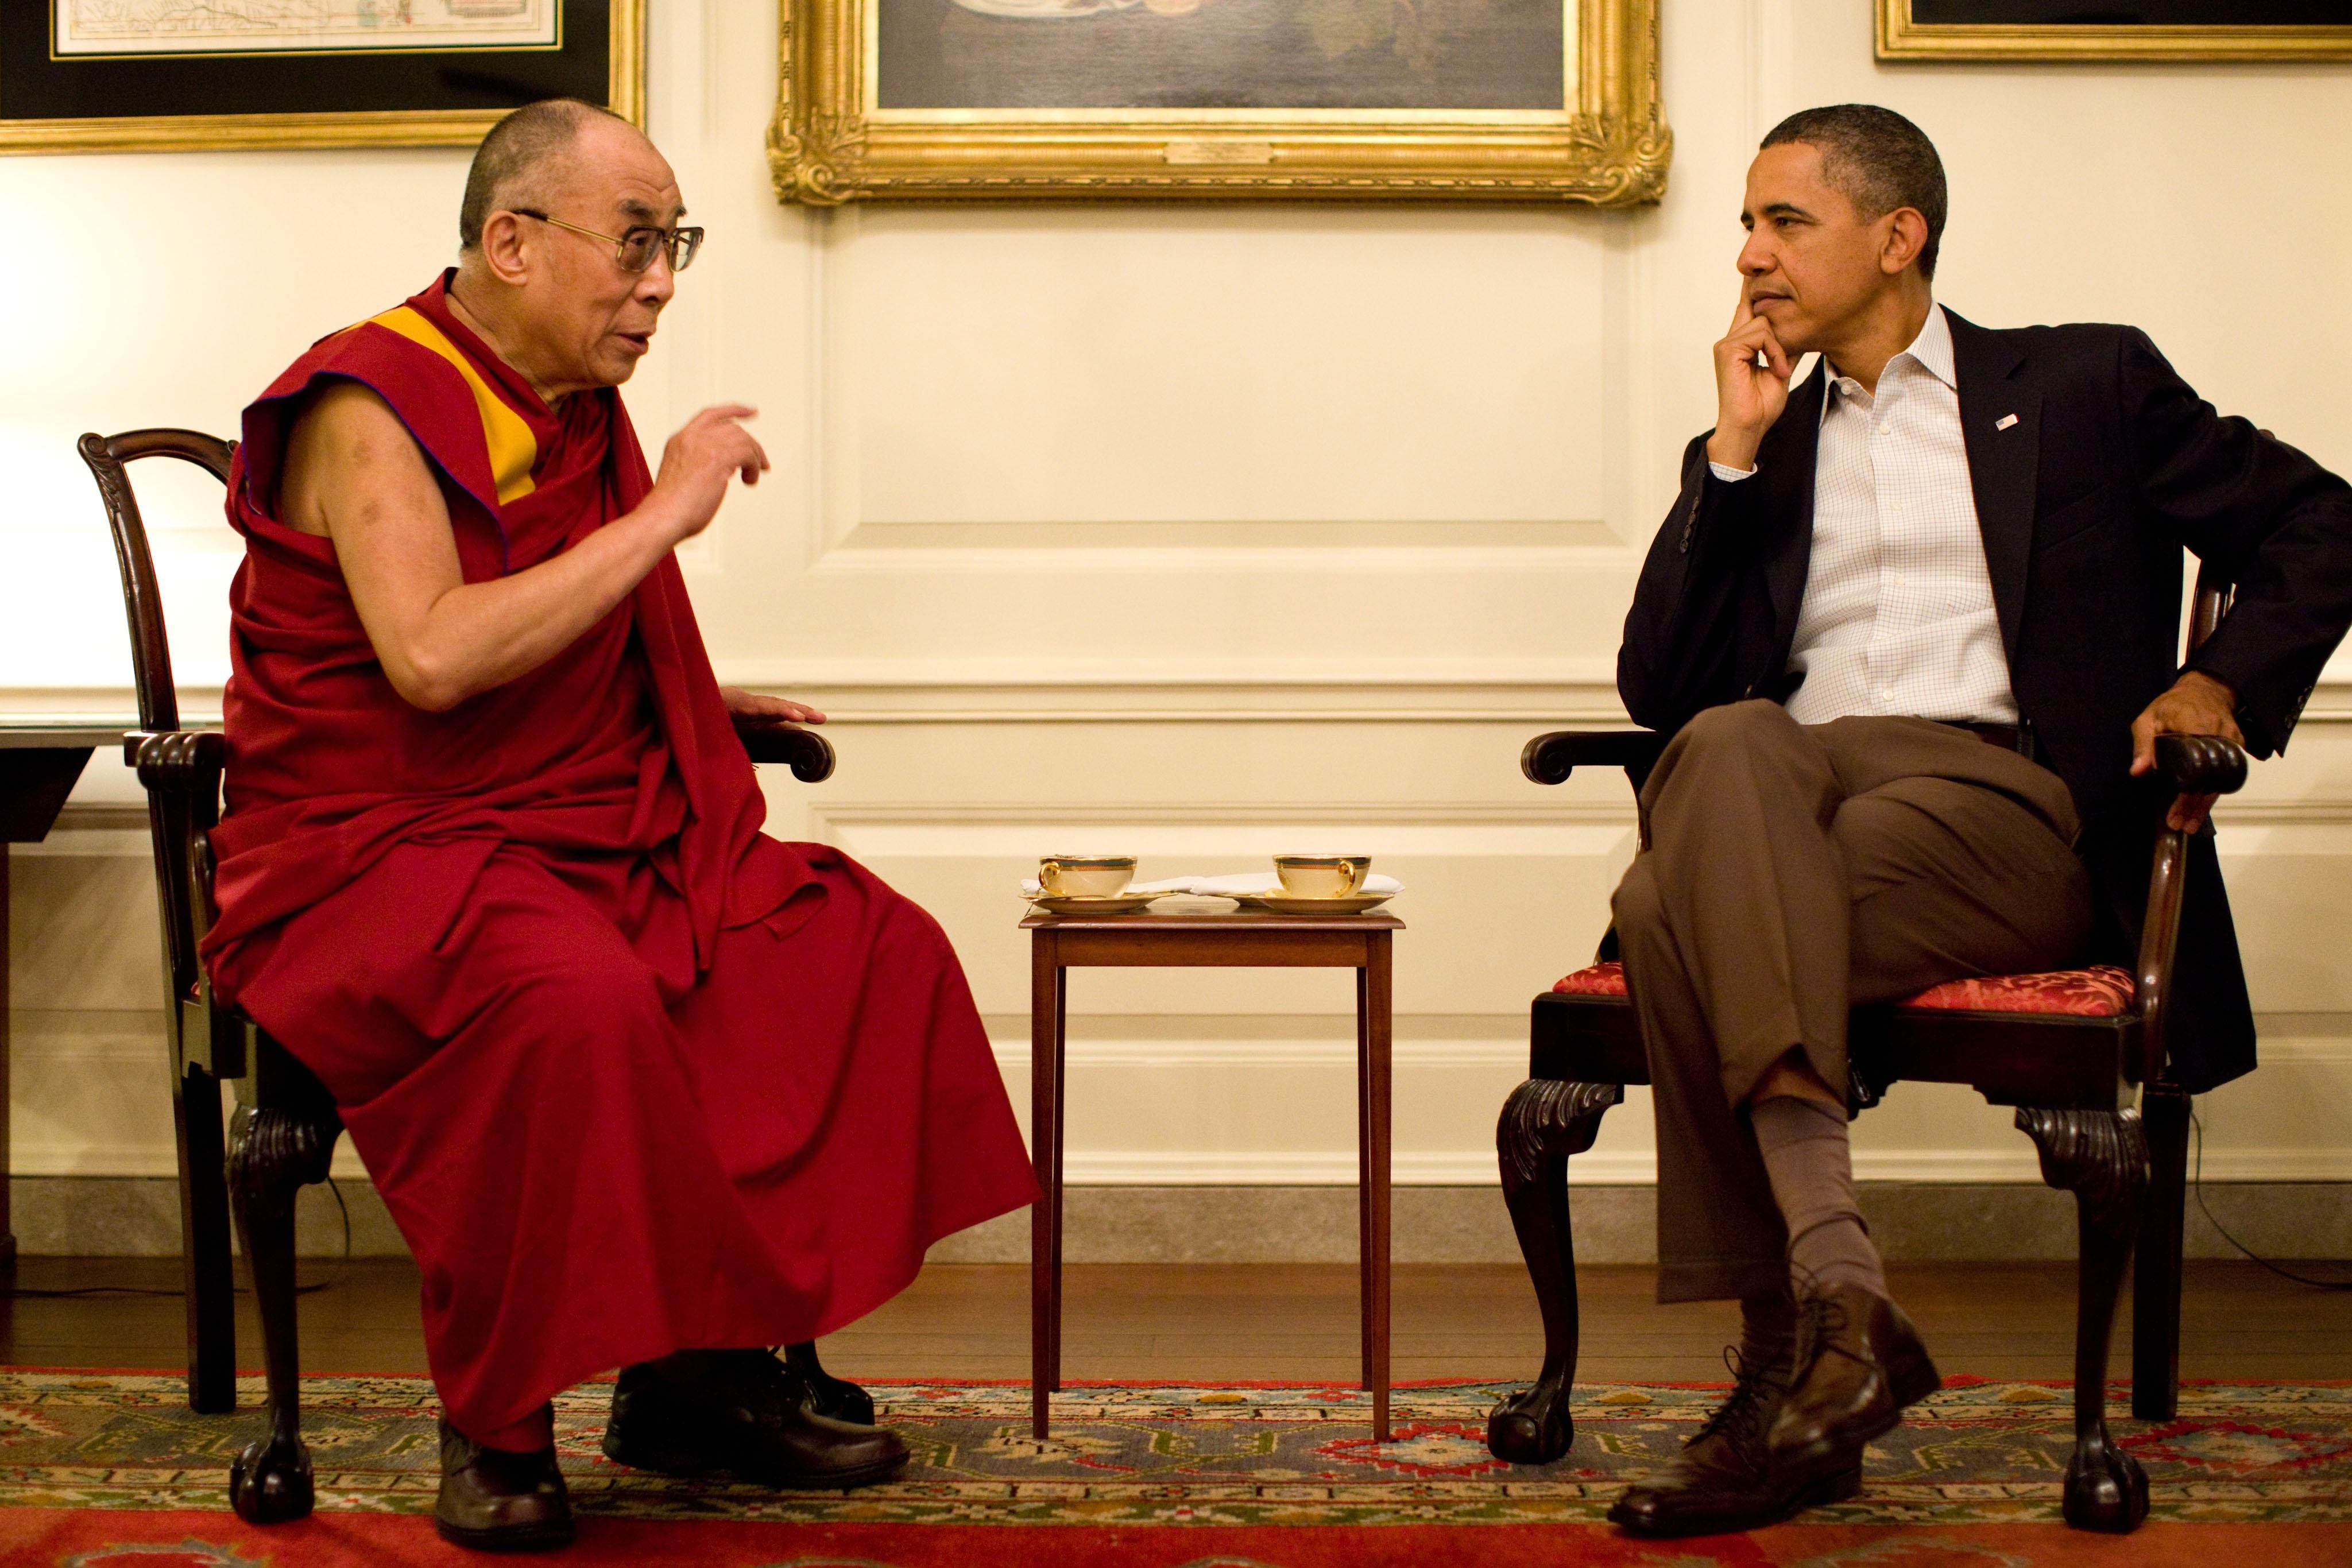 Free Meeting United States Of America Buddhist Hawaii